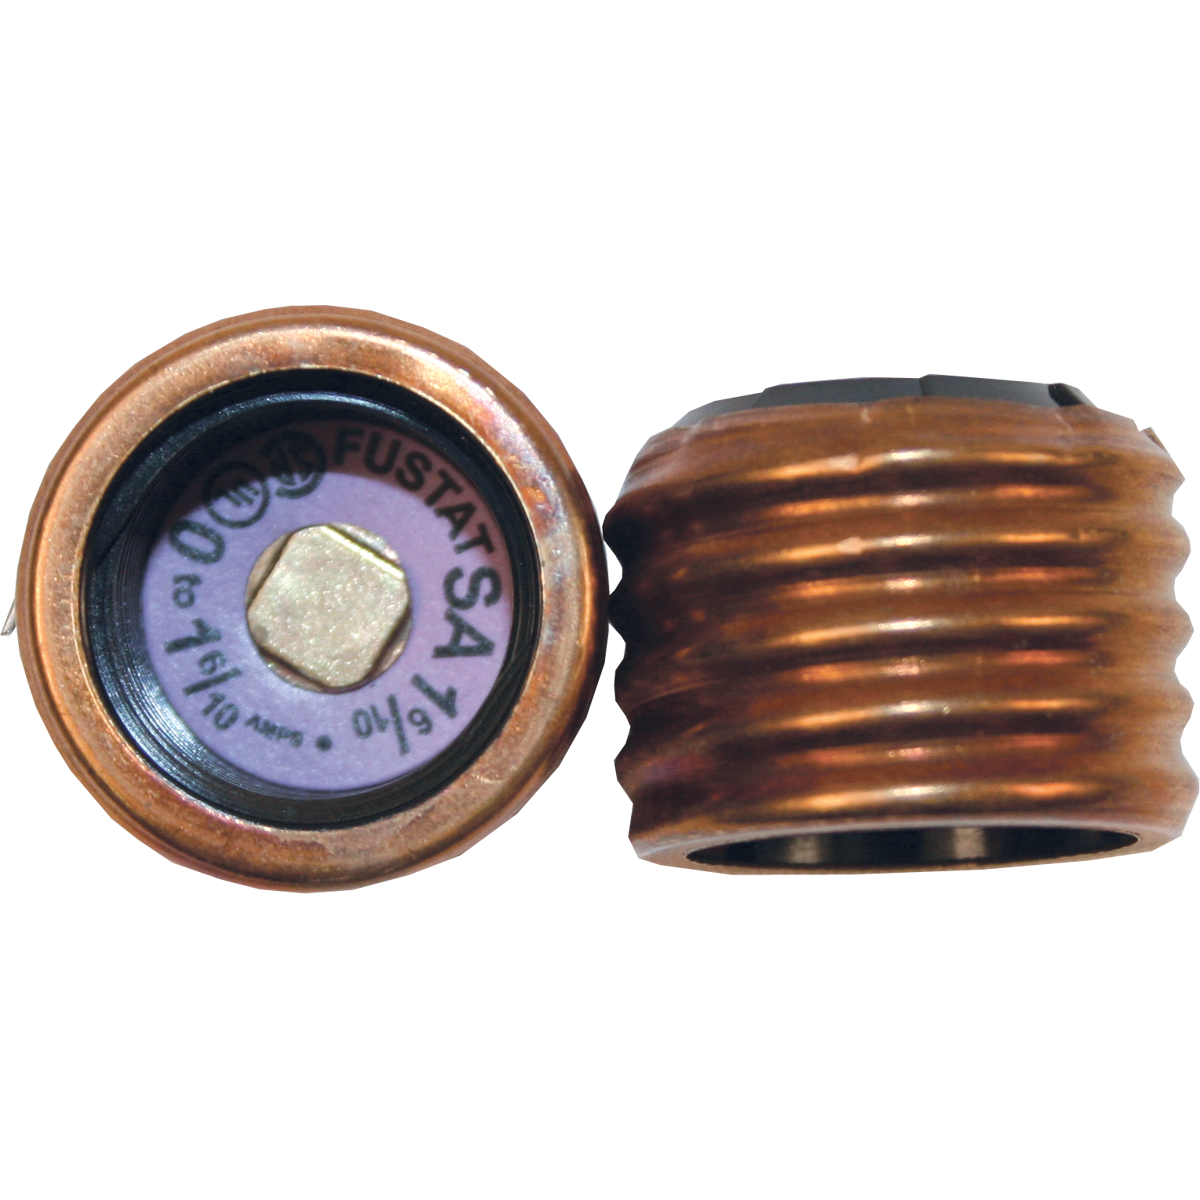 s type fuse box adapter 02 jaguar s type fuse box type s fuse adapter - bramec corporation - wholesale ...